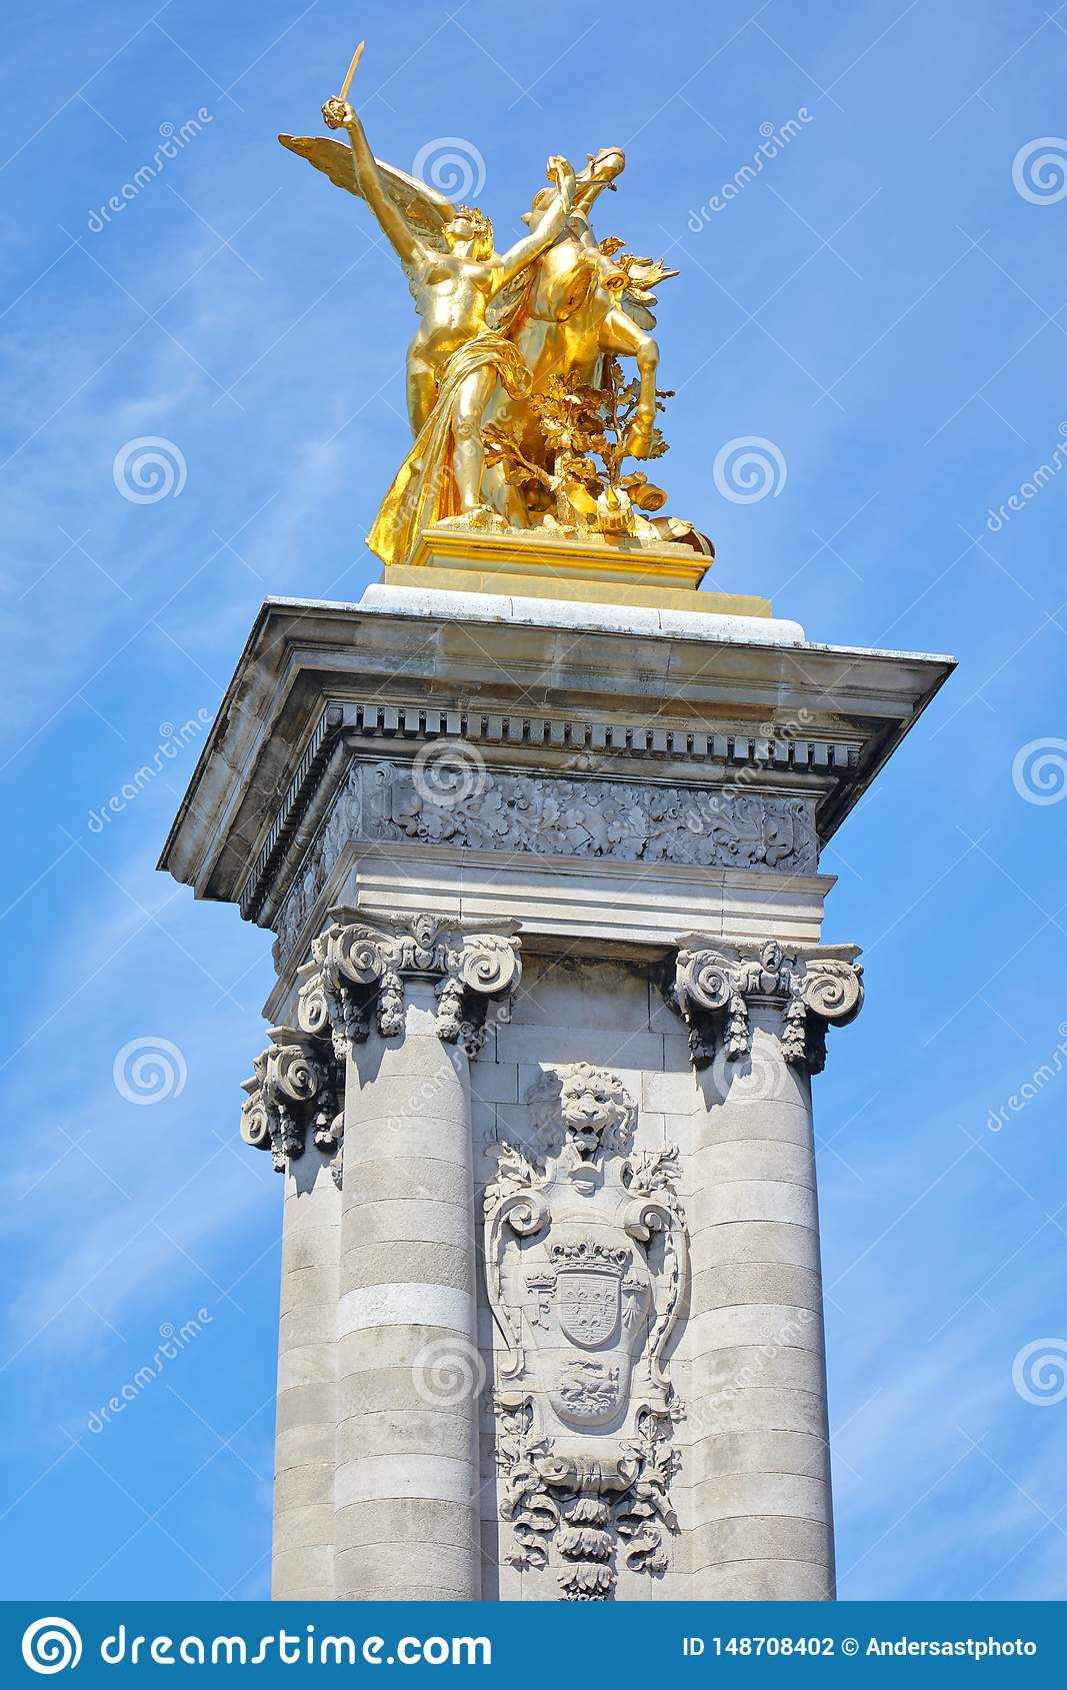 Golden Renommee Du Commerce- Statue On The Pont Alexandre